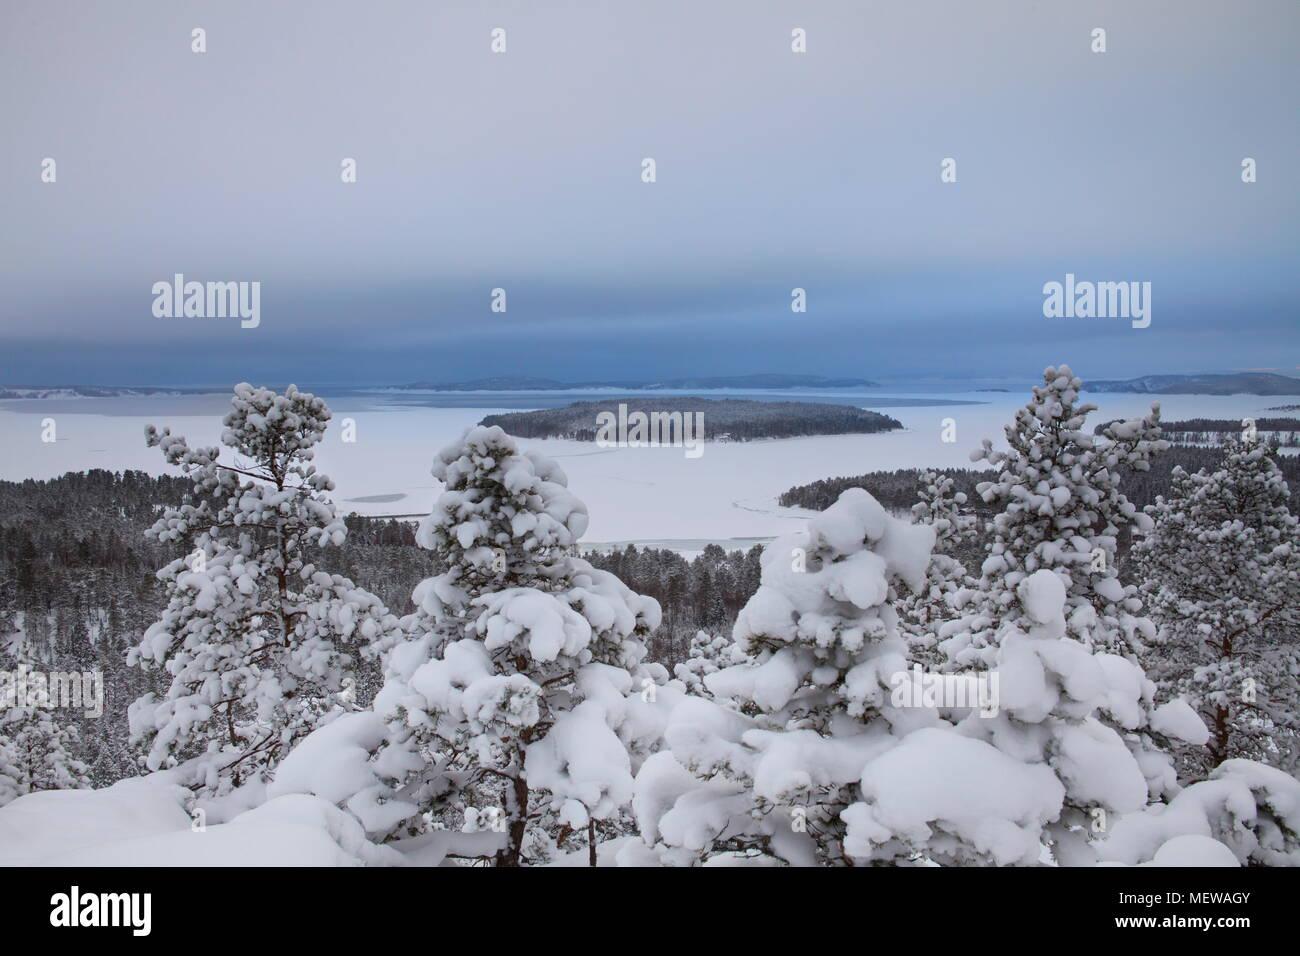 View from Ögeltjärnsberget over the Baltic Sea. Höga Kusten near Örnsköldsvik, Sweden. Stock Photo